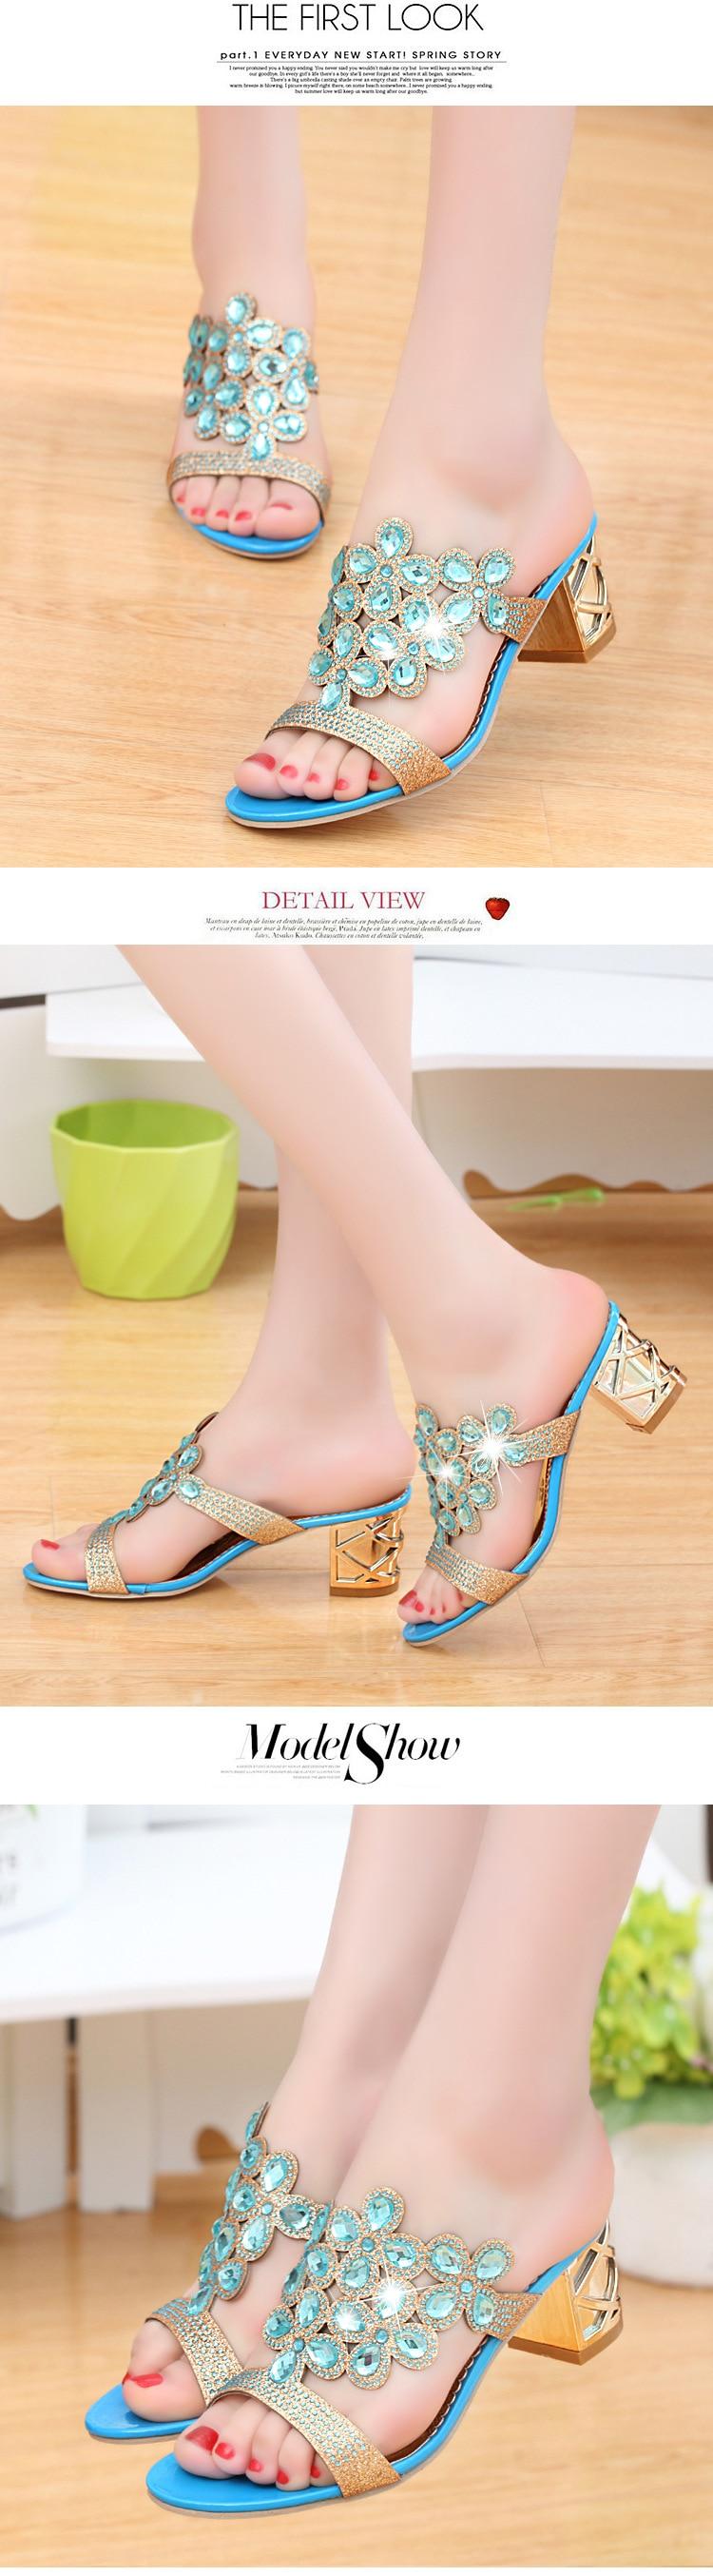 HTB1Z43GiStYBeNjSspkq6zU8VXaX Designer Sandals Women 2018 Ladies Slides Women Slippers Sandals Summer Crystal Shoes Peep Toe Middle Heels Zapatos Mujer